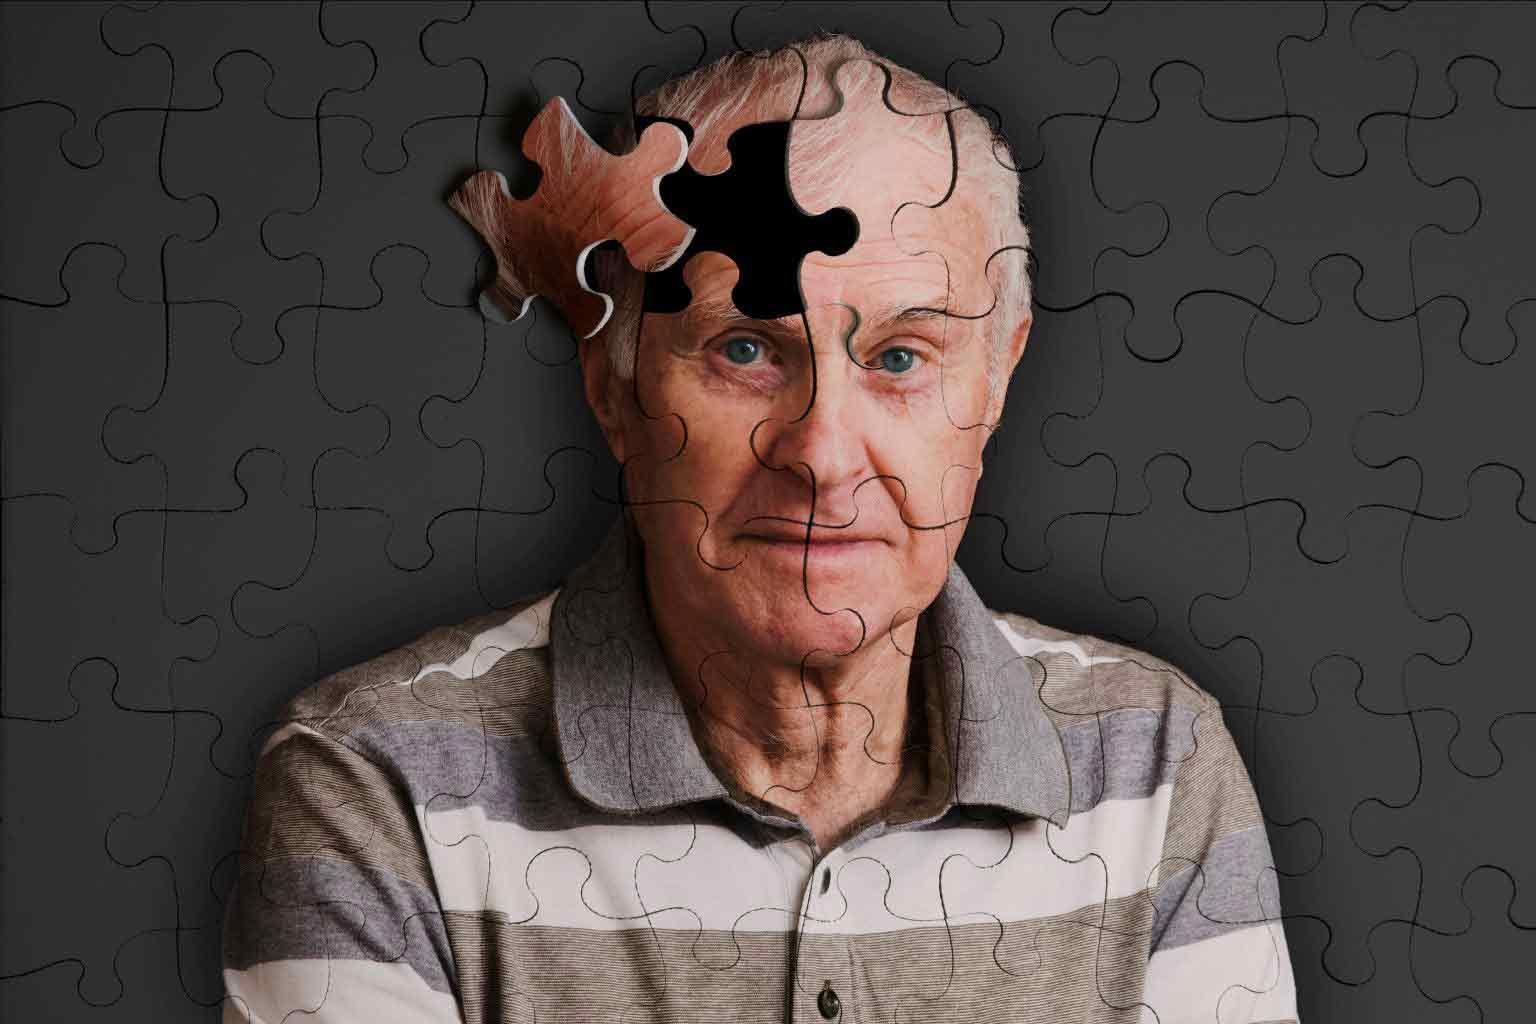 آلزایمر /  Alzheimer